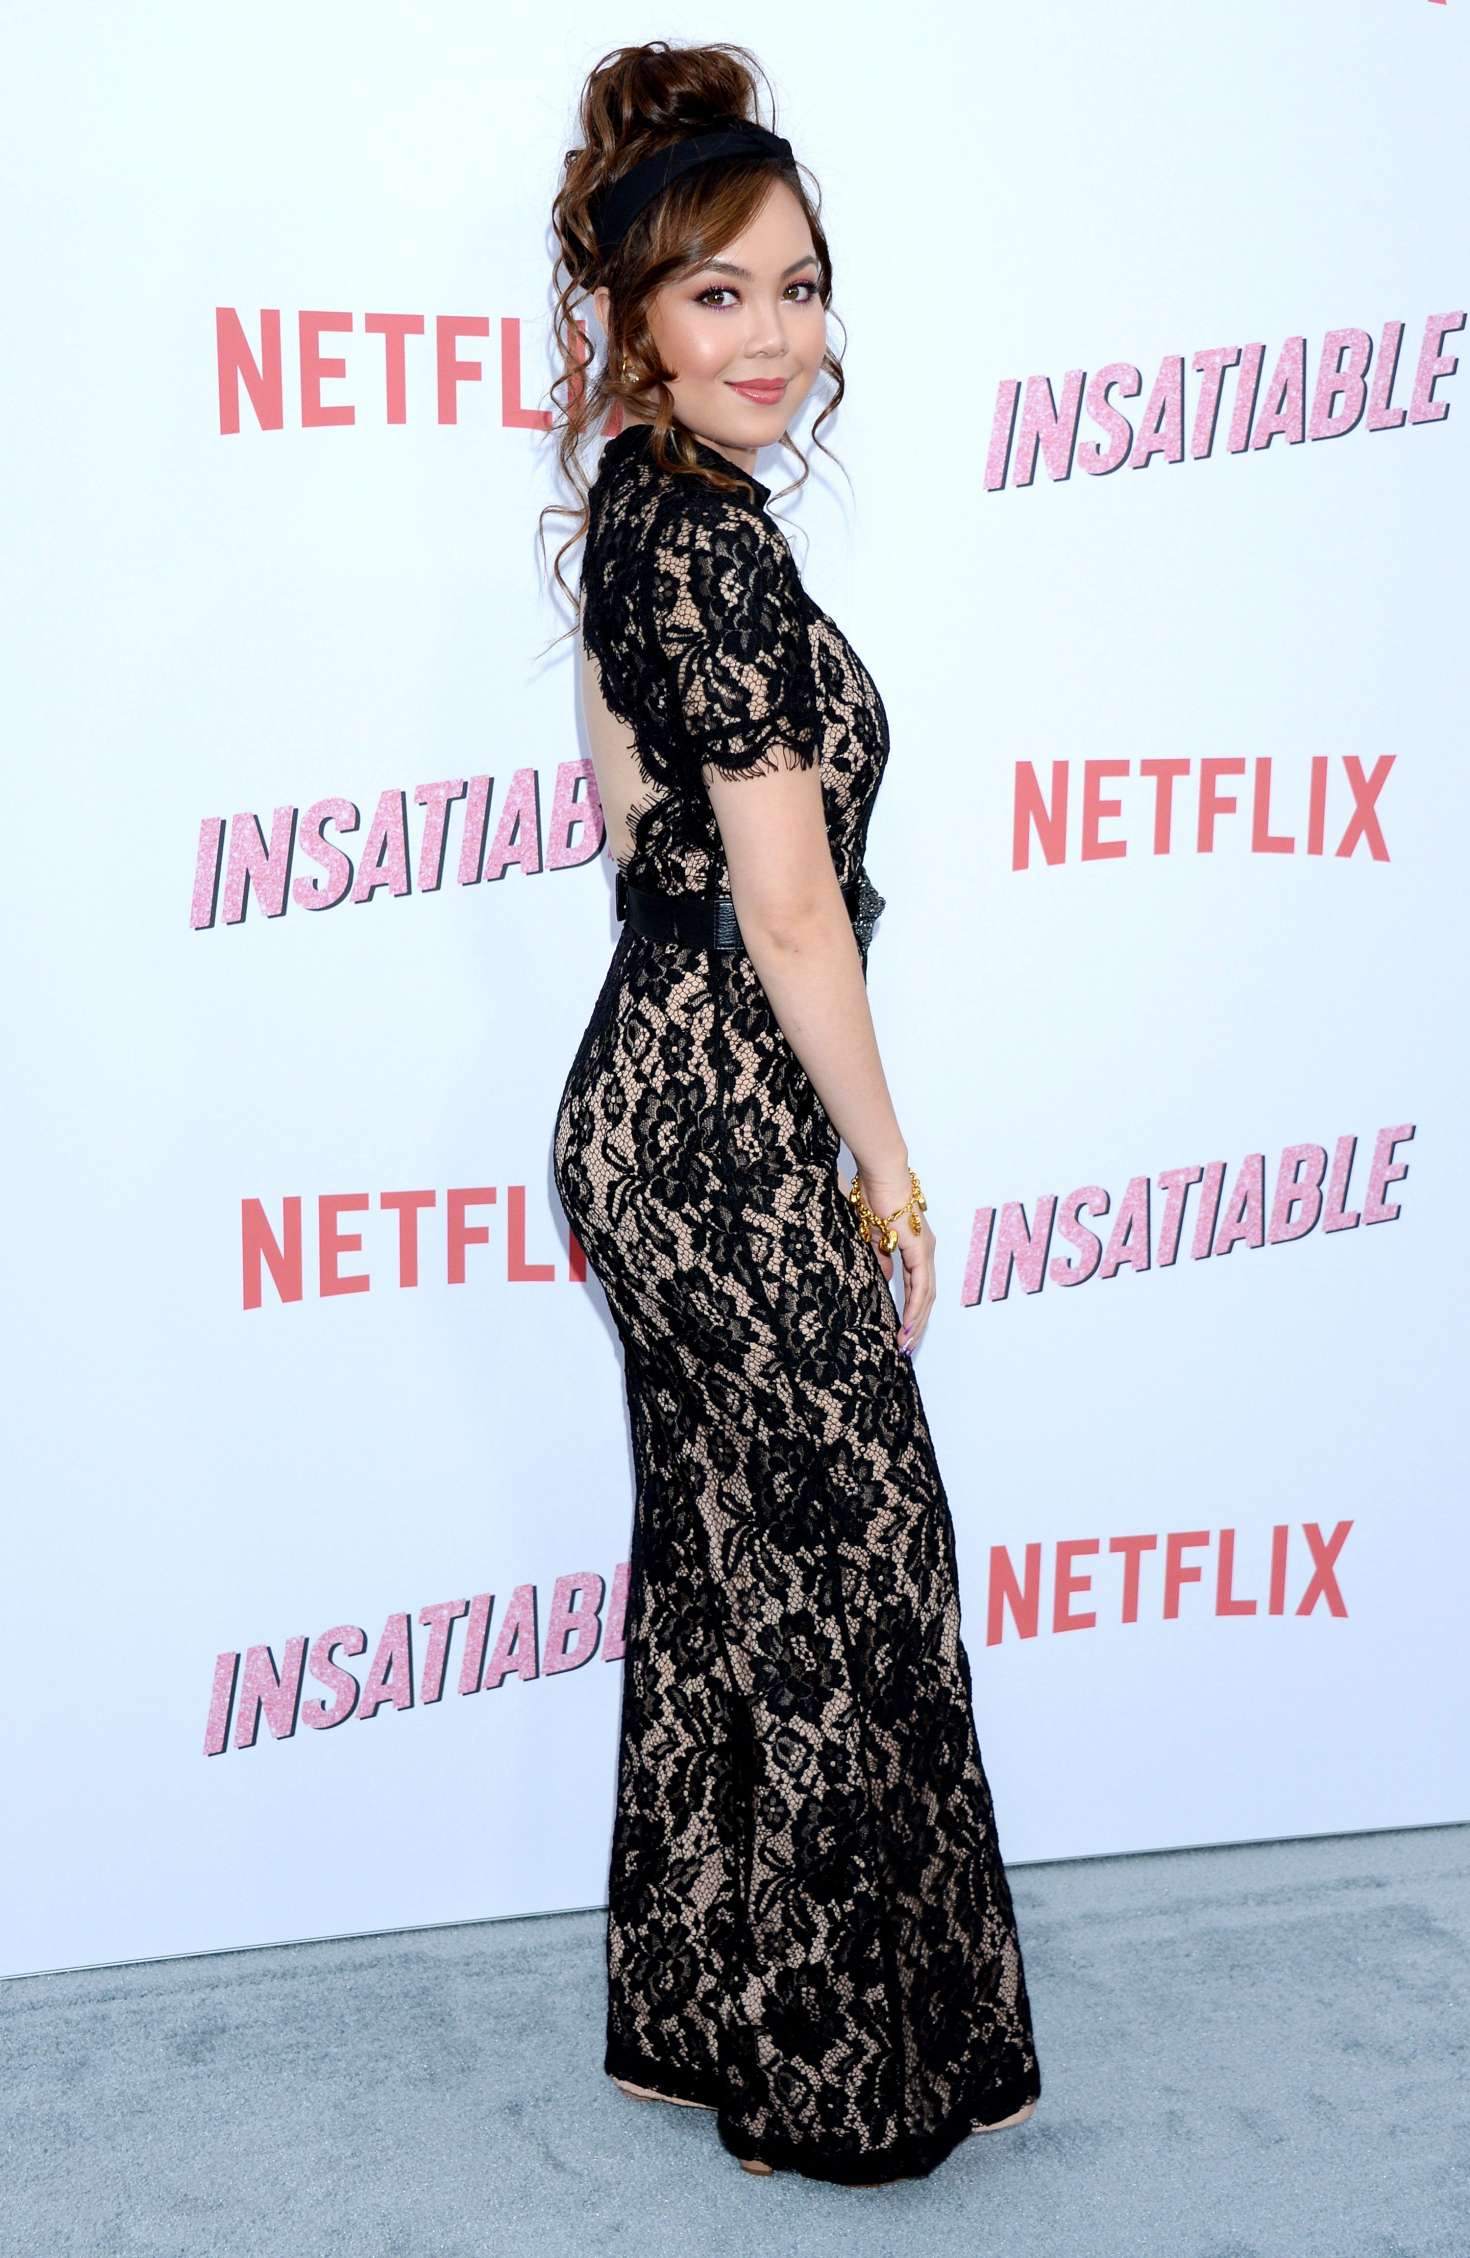 Anna Maria Perez De Tagle 2018 : Anna Maria Perez de Tagle: Insatiable Premiere in Los Angeles -07